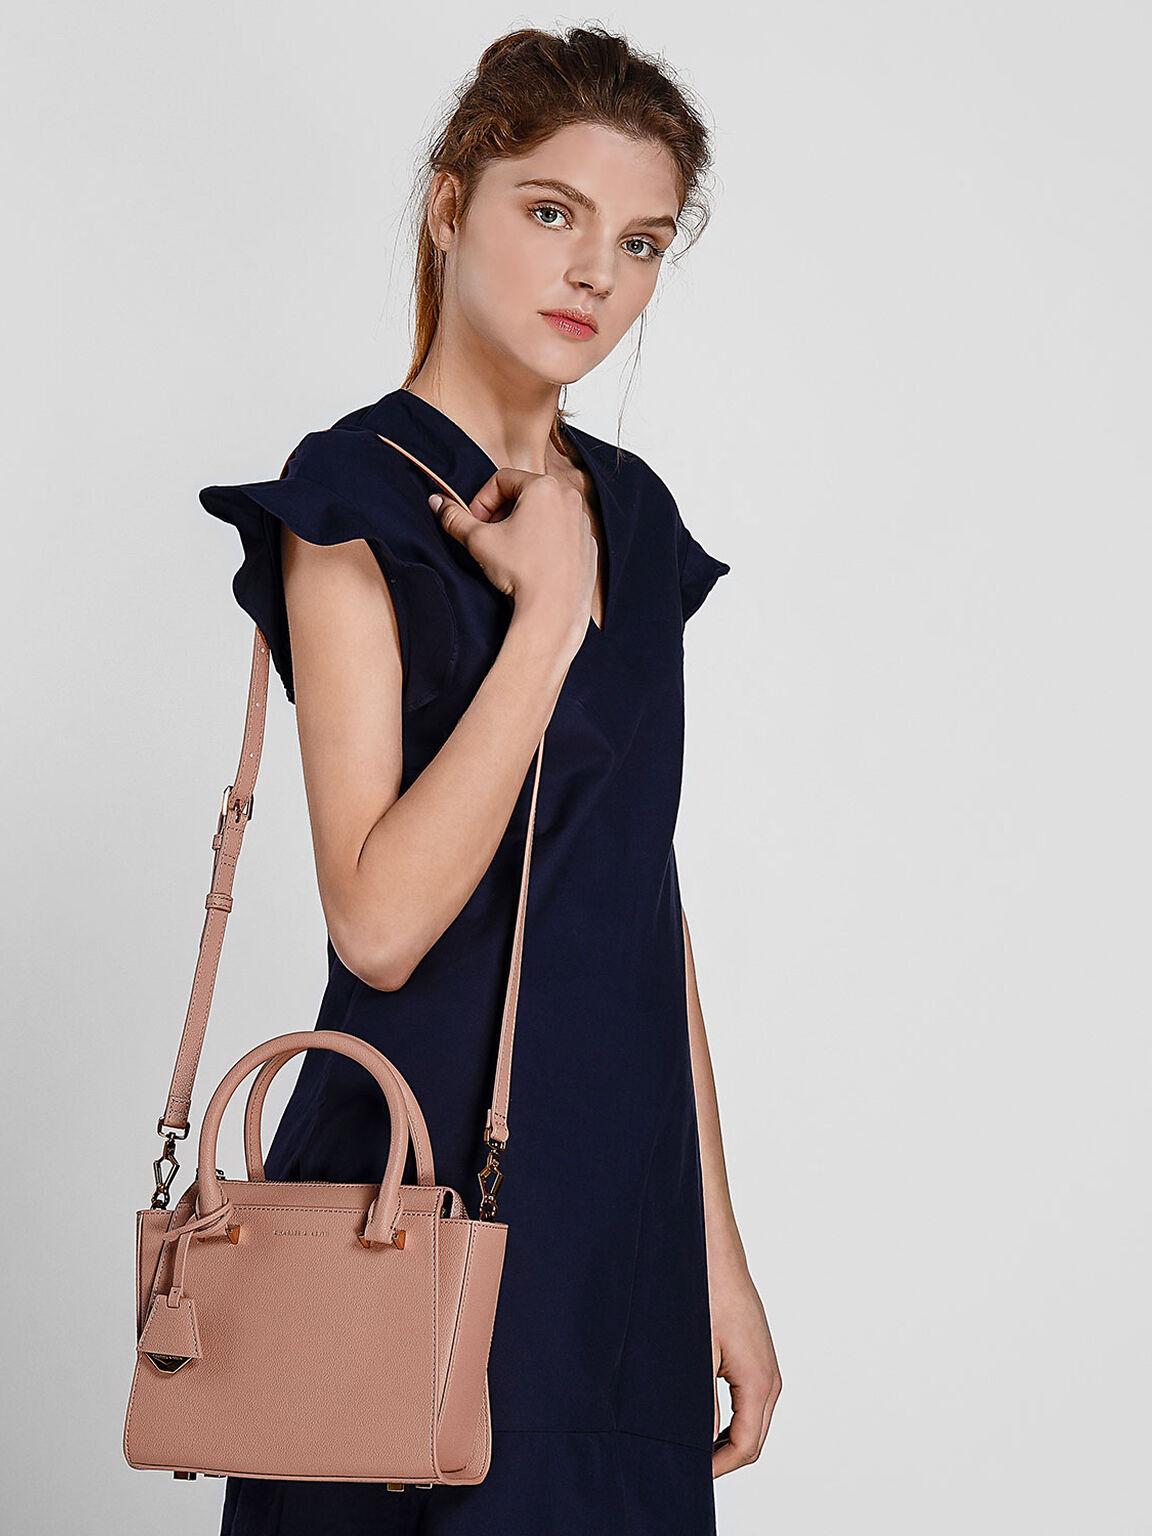 Small City Bag, Blush, hi-res